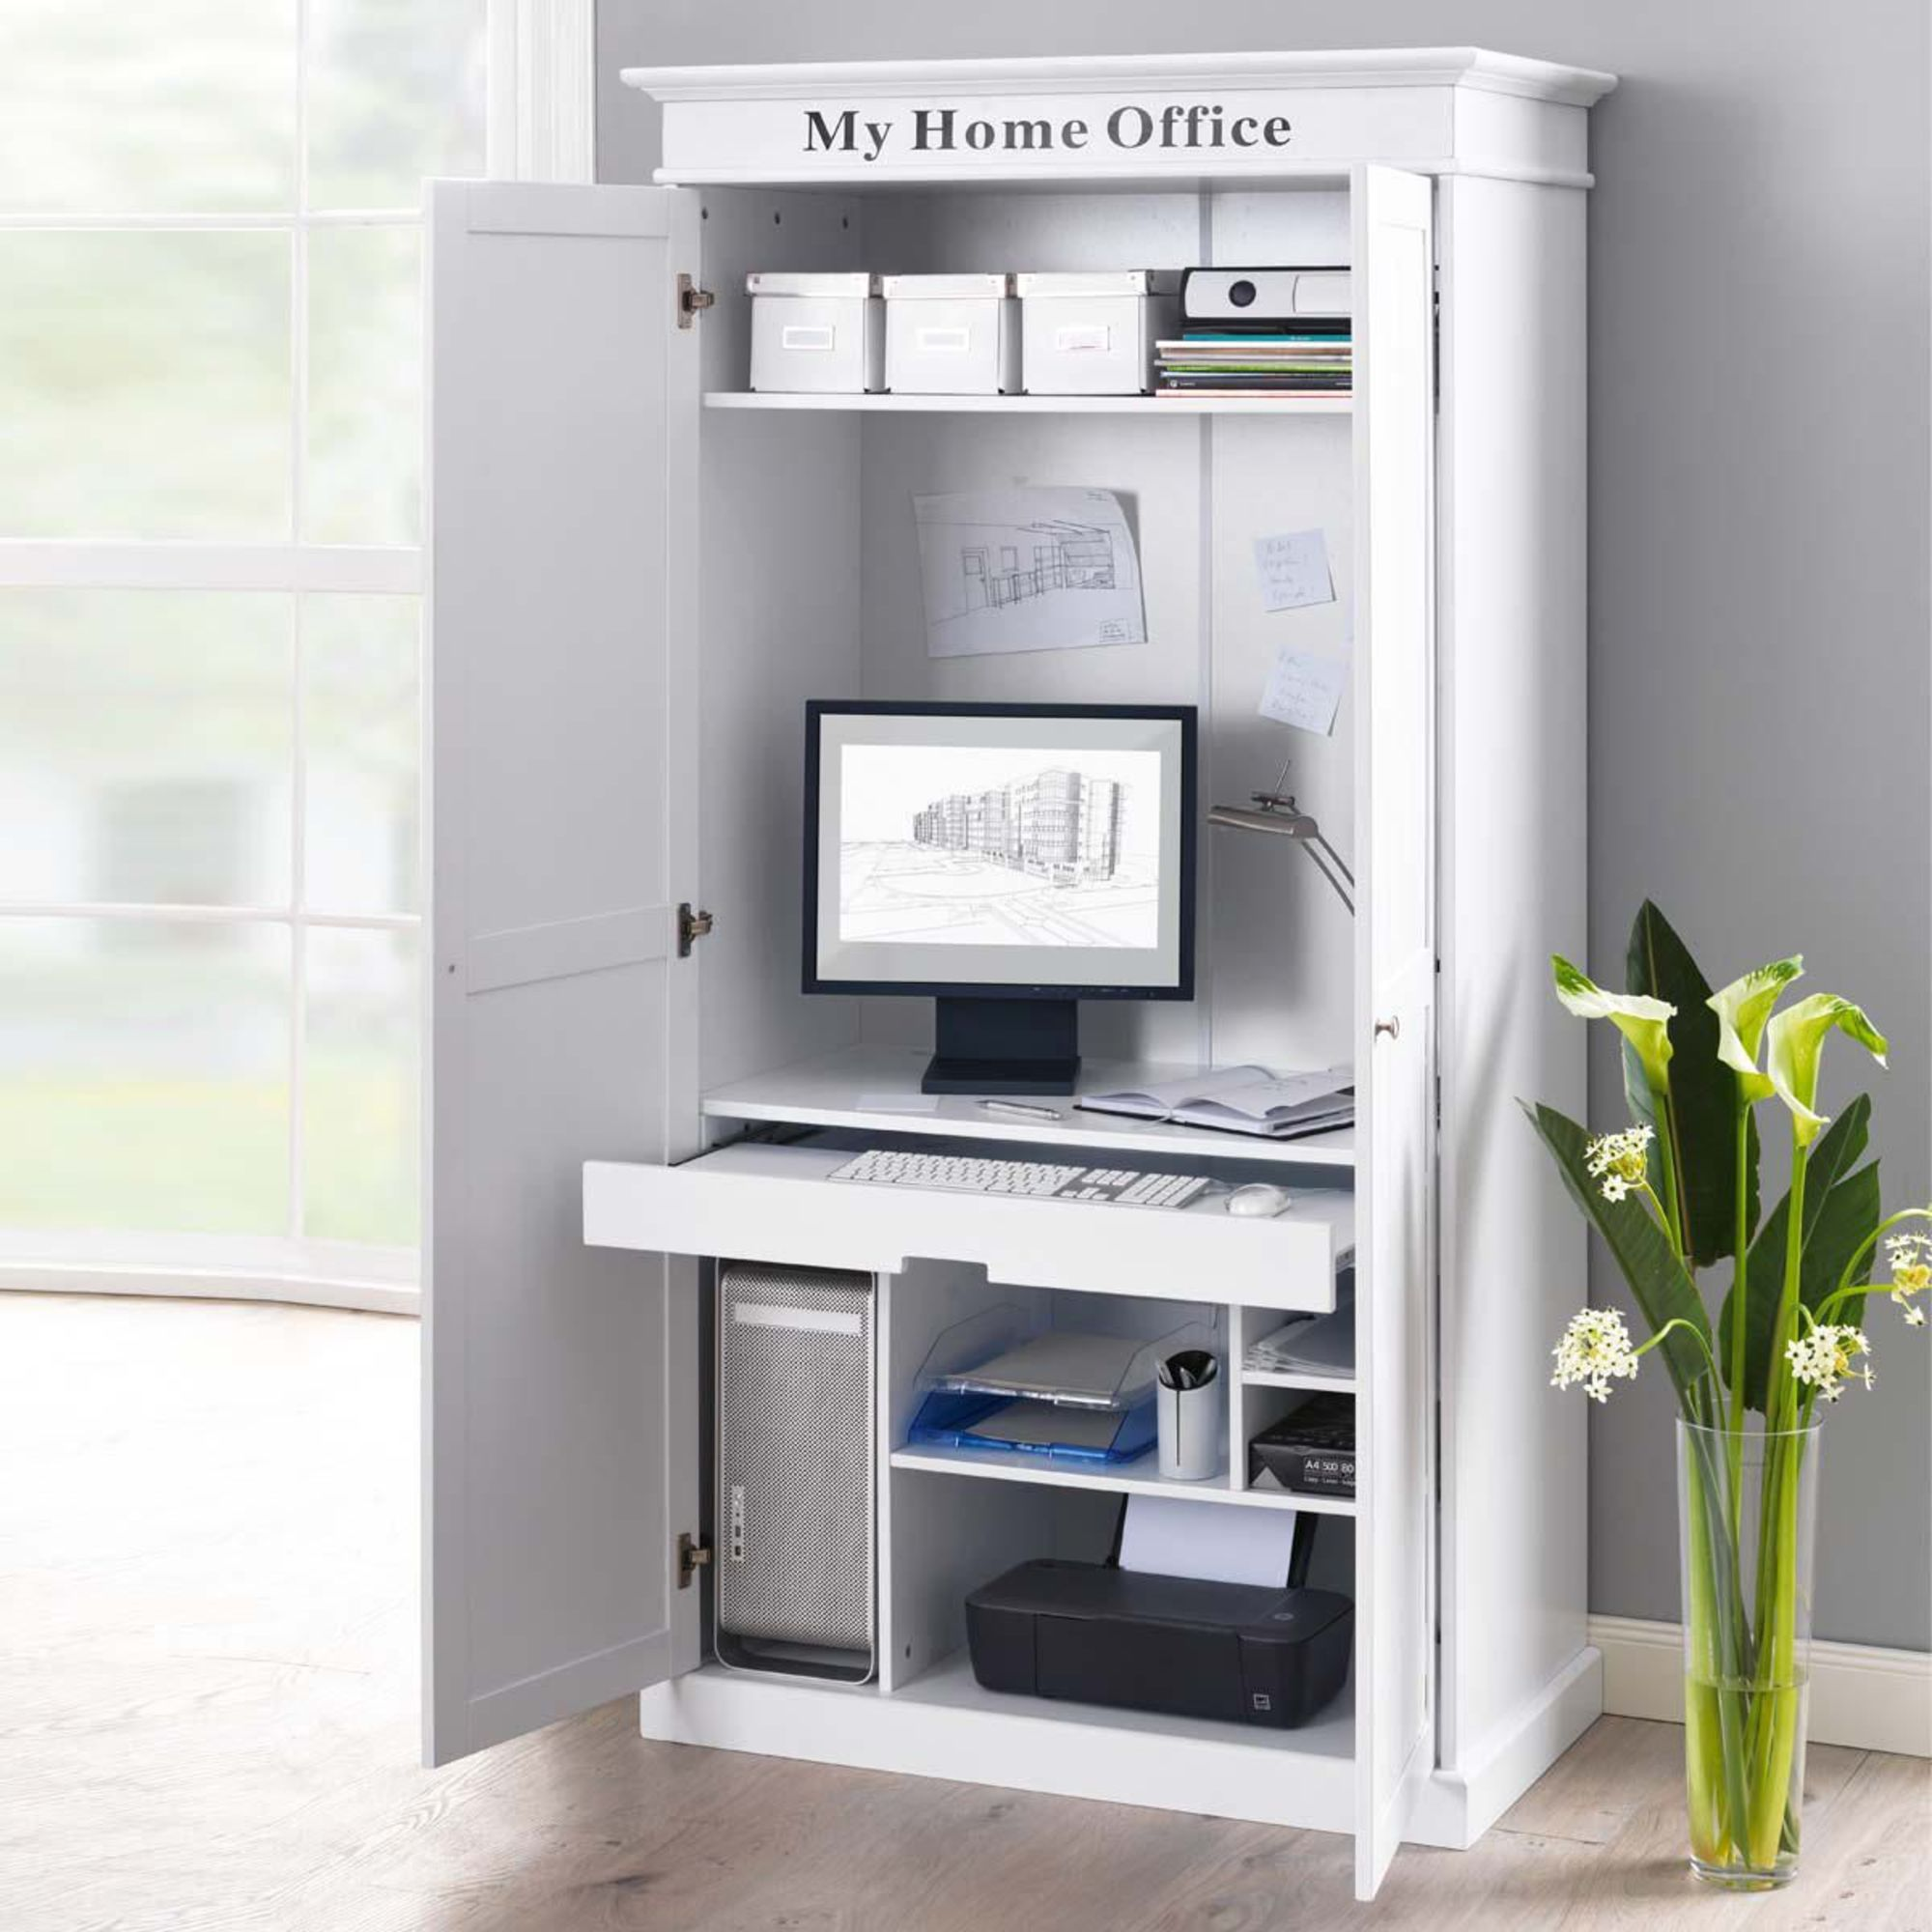 wei e k che wei e arbeitsplatte. Black Bedroom Furniture Sets. Home Design Ideas